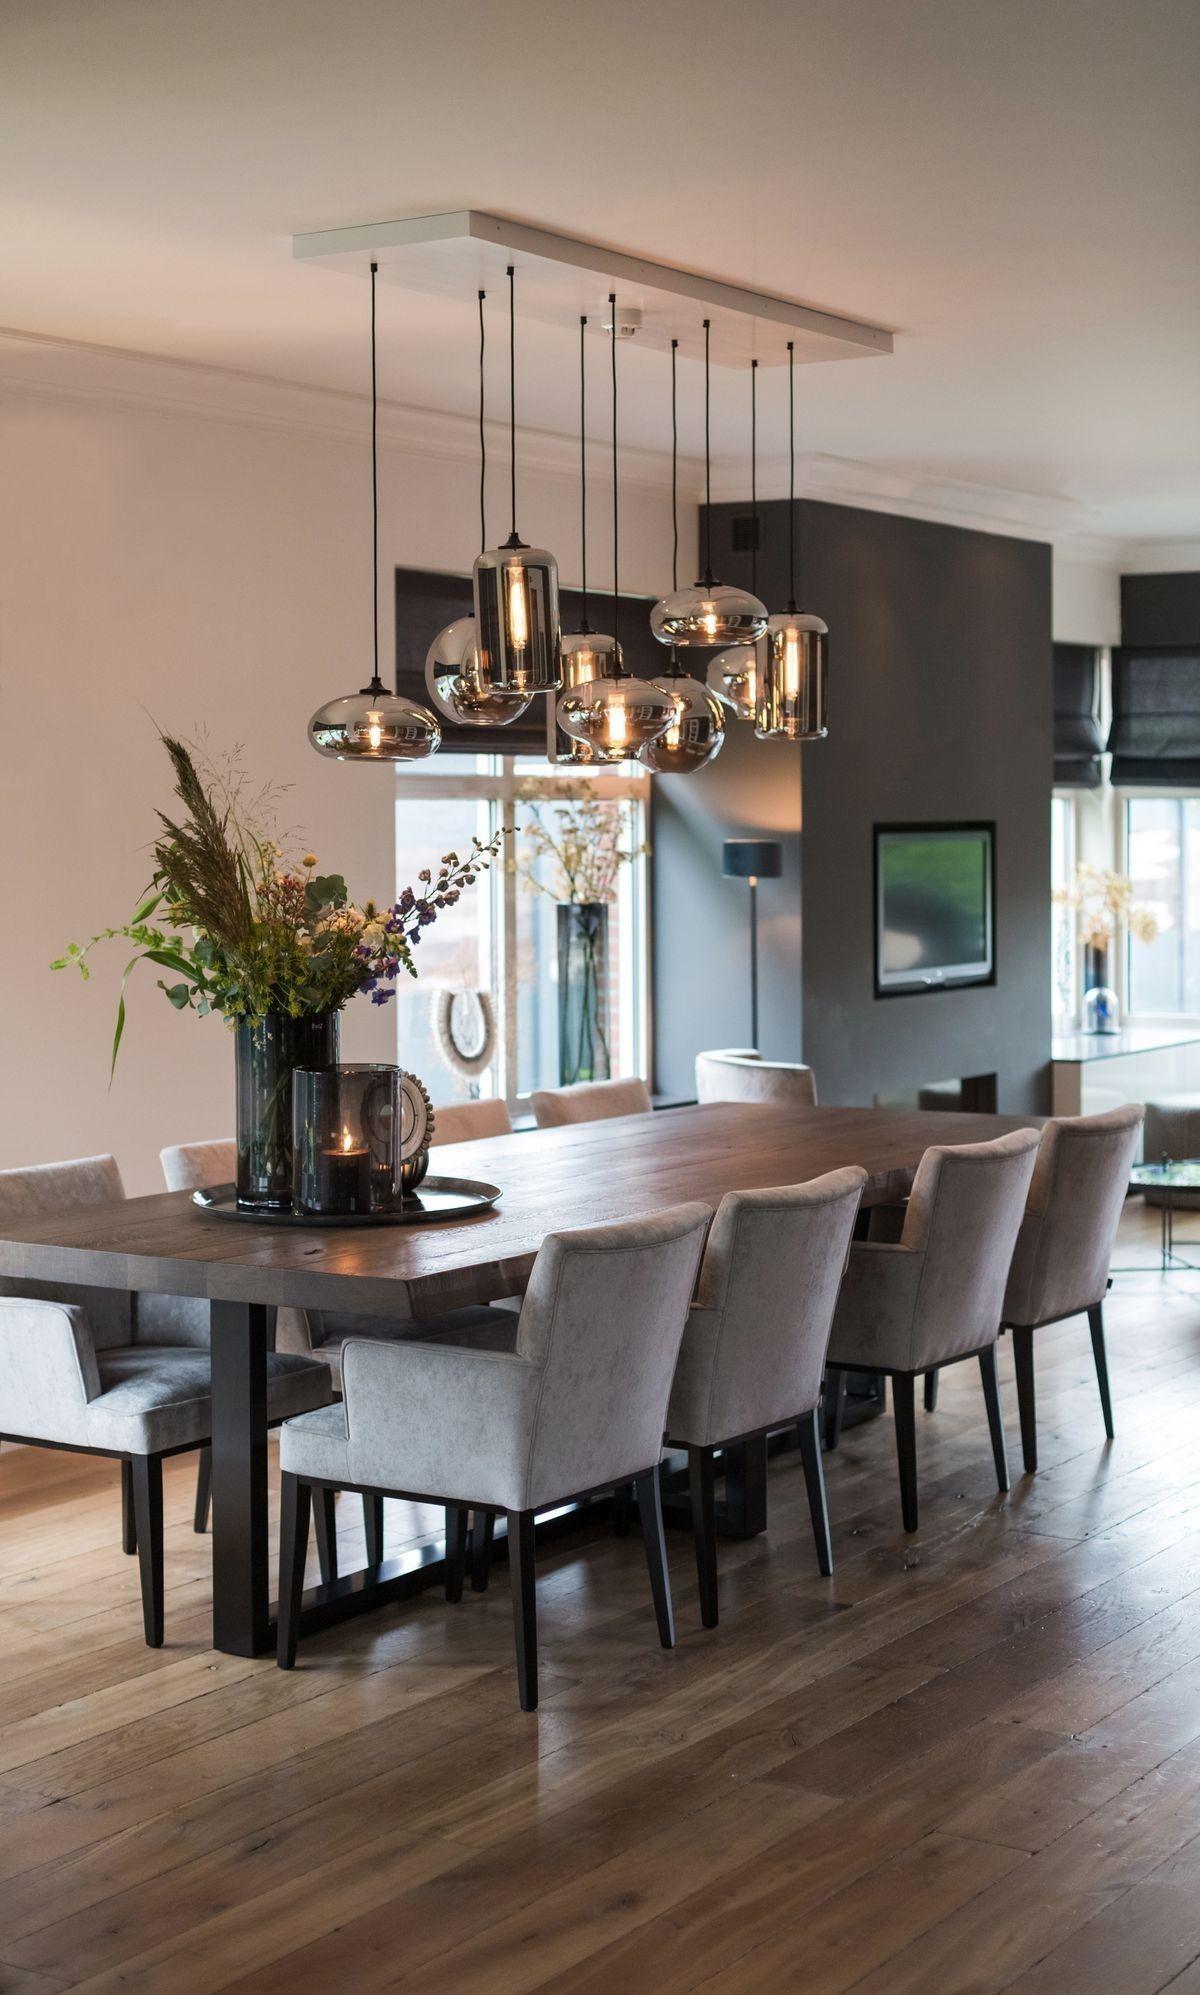 Pin By Aya On Home Design Inspiration Stylish Dining Room Dining Room Decor Modern Dining Room Inspiration